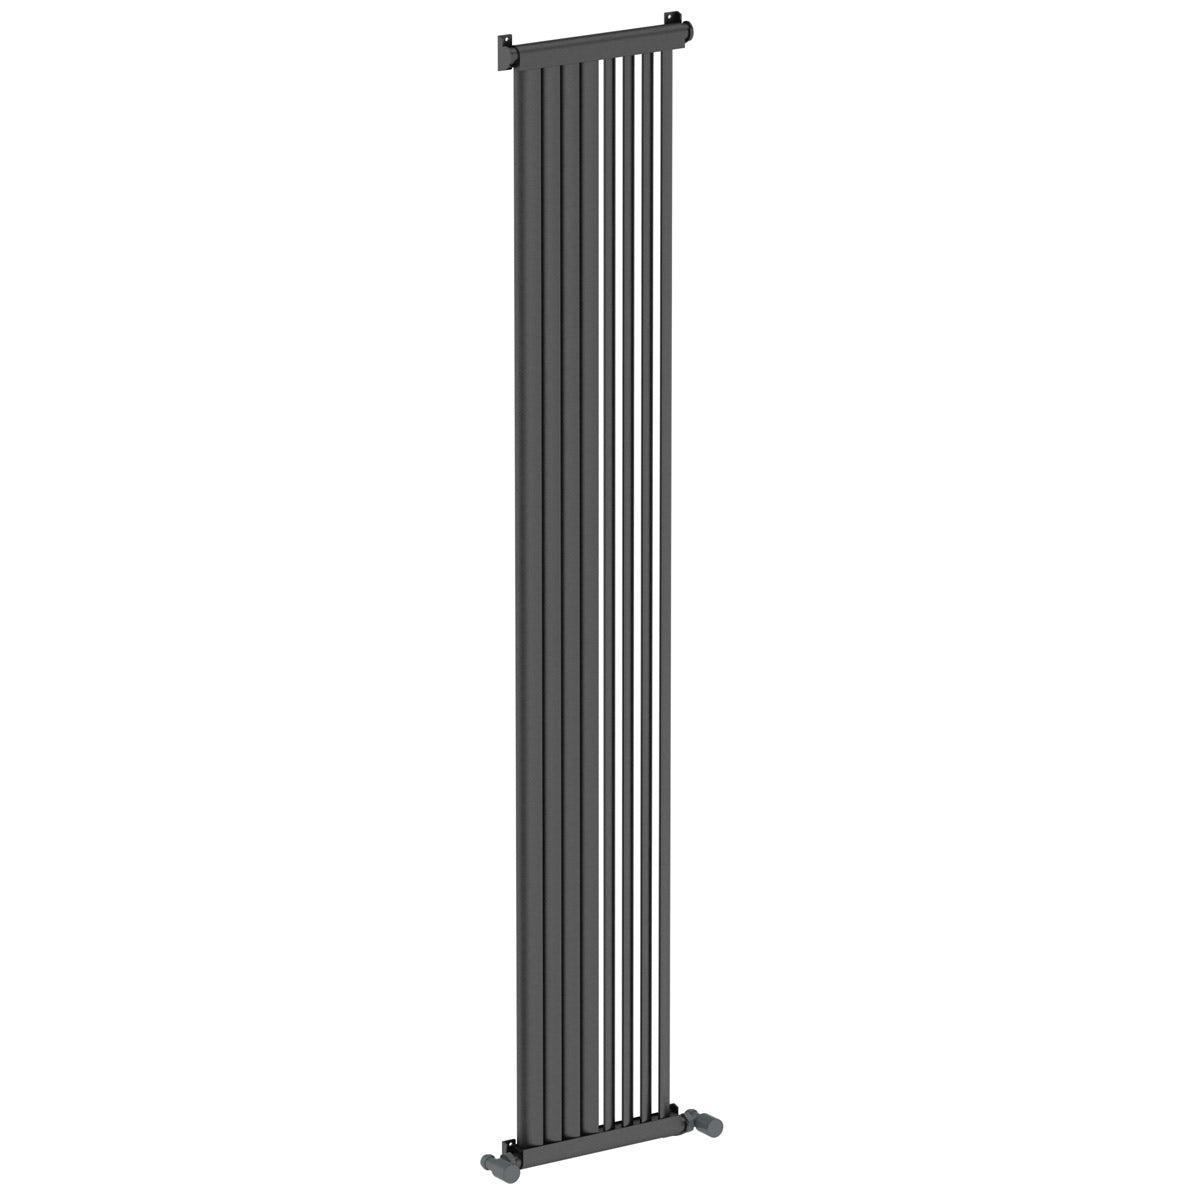 Mode Zephyra anthracite vertical radiator 1800 x 328